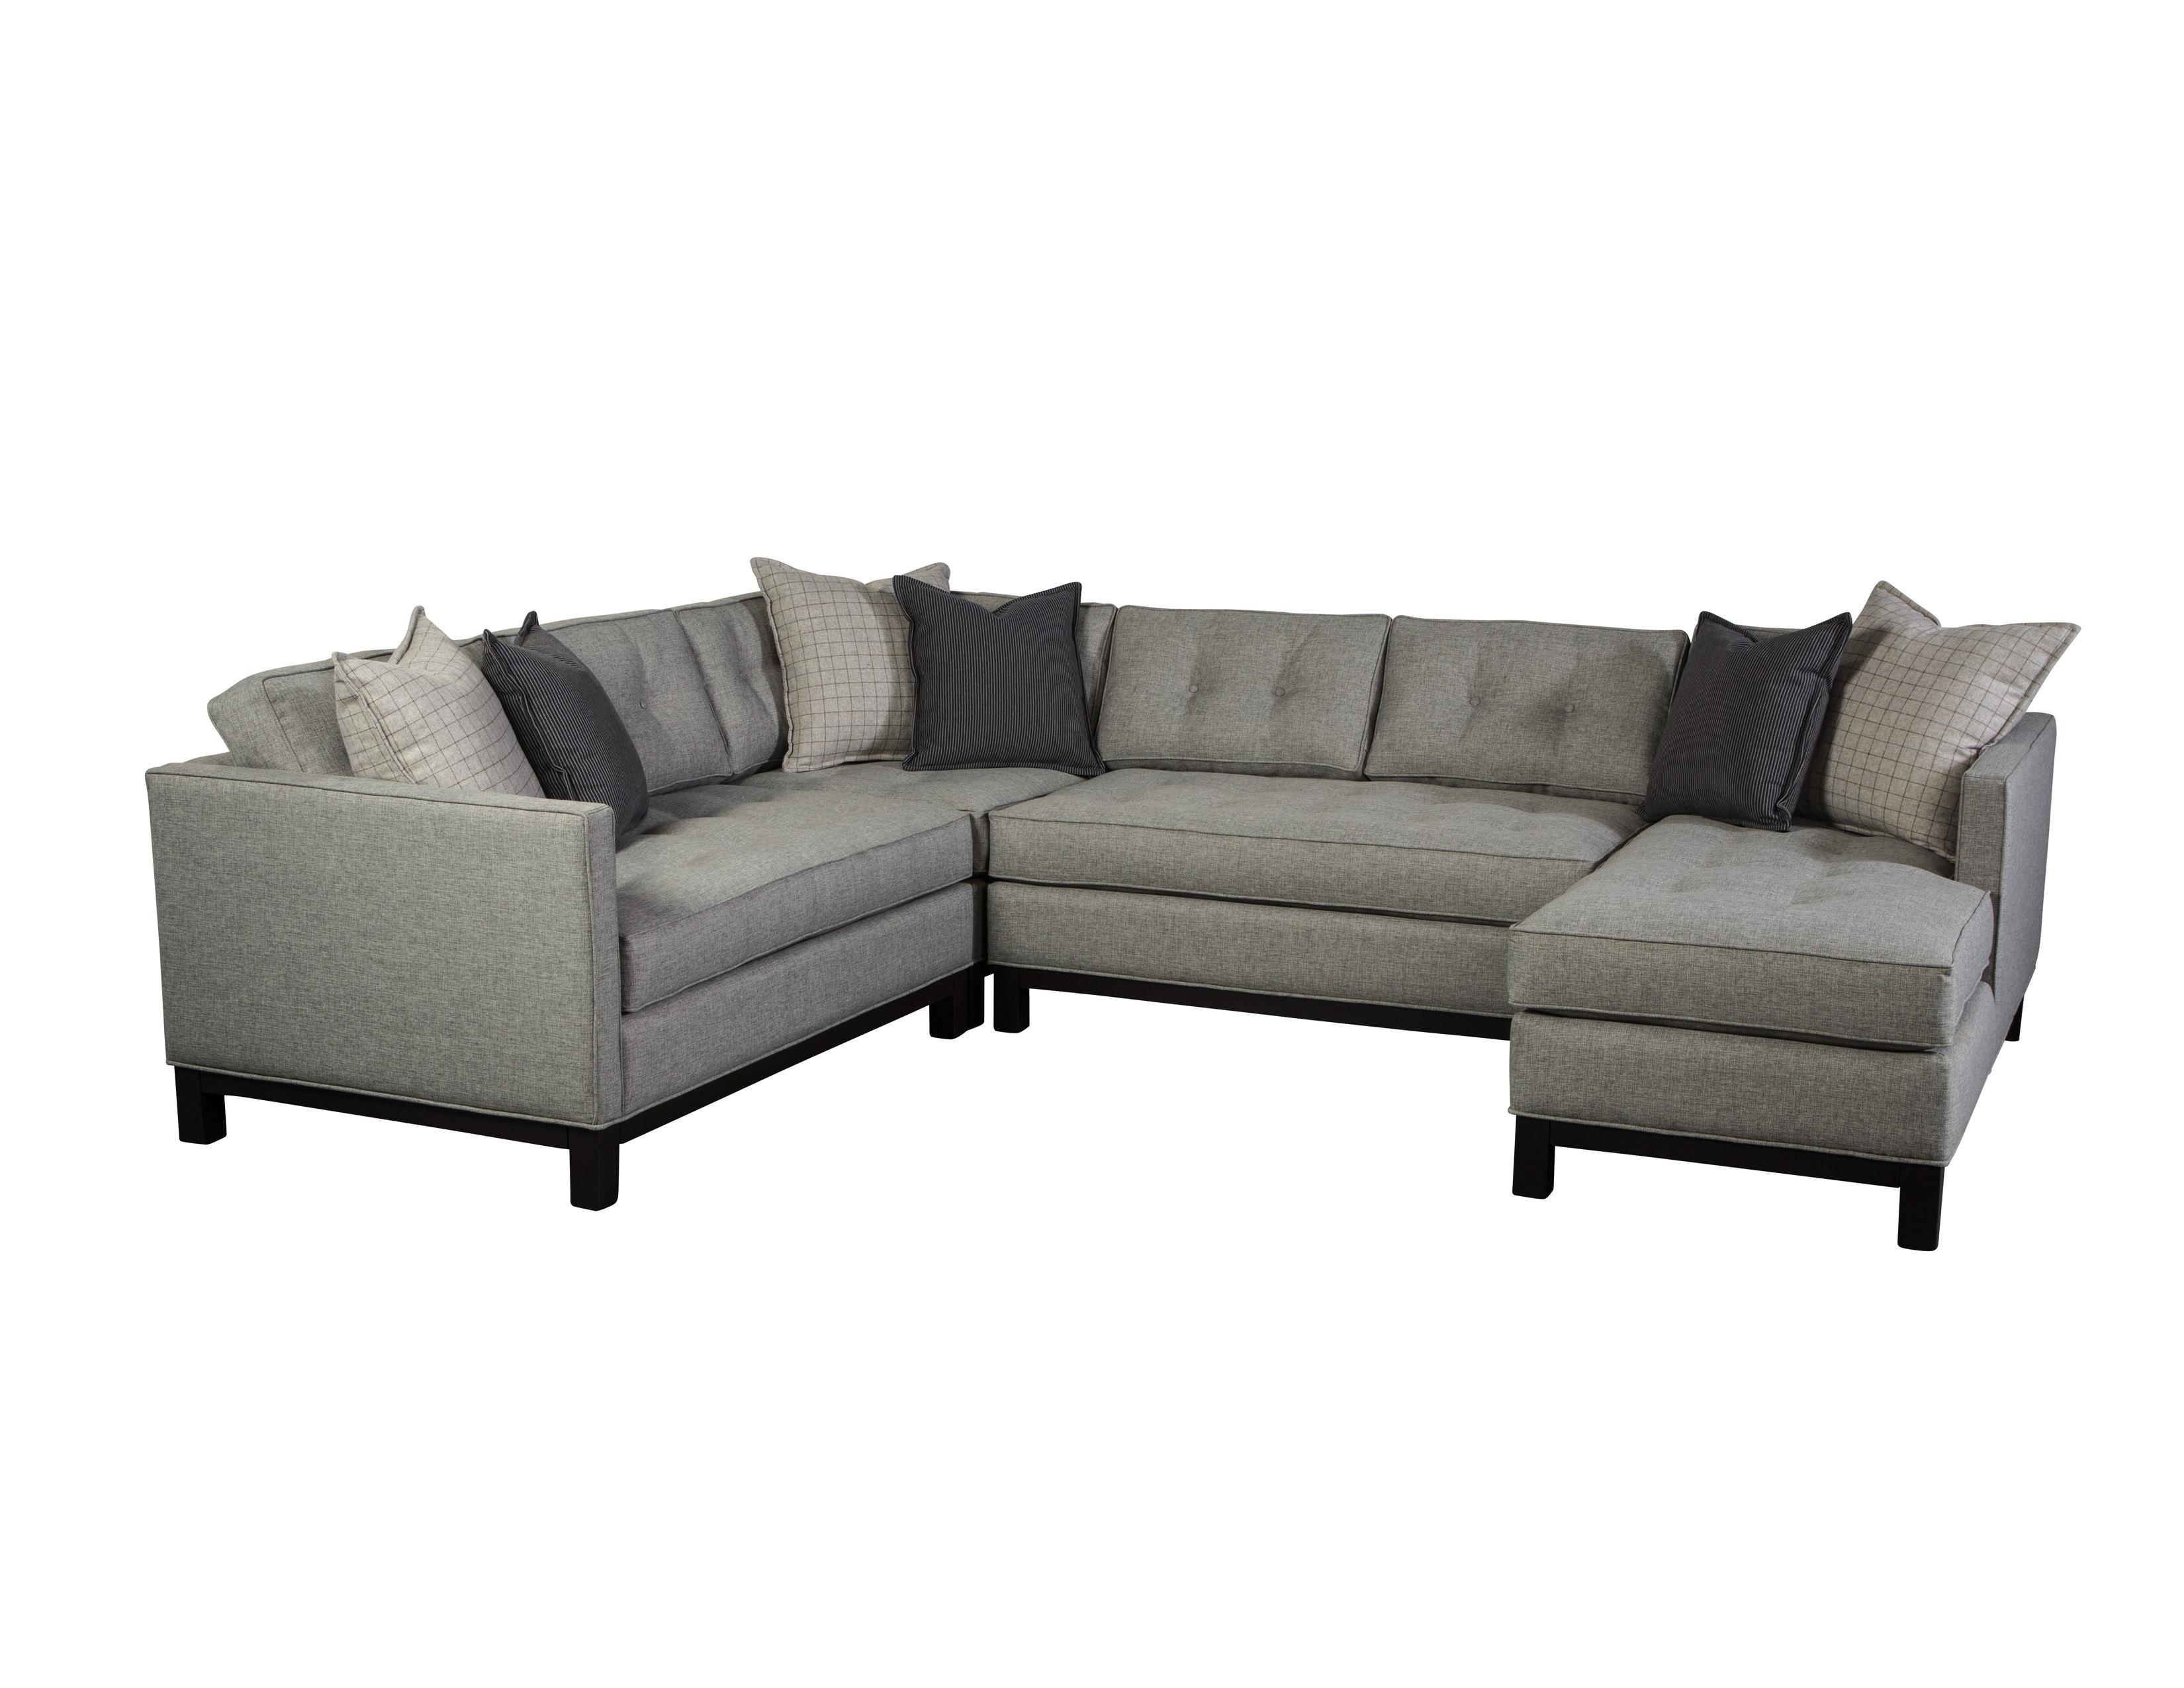 sectional sofa dallas fort worth best bed deals uk jonathan louis international living room goodwyn